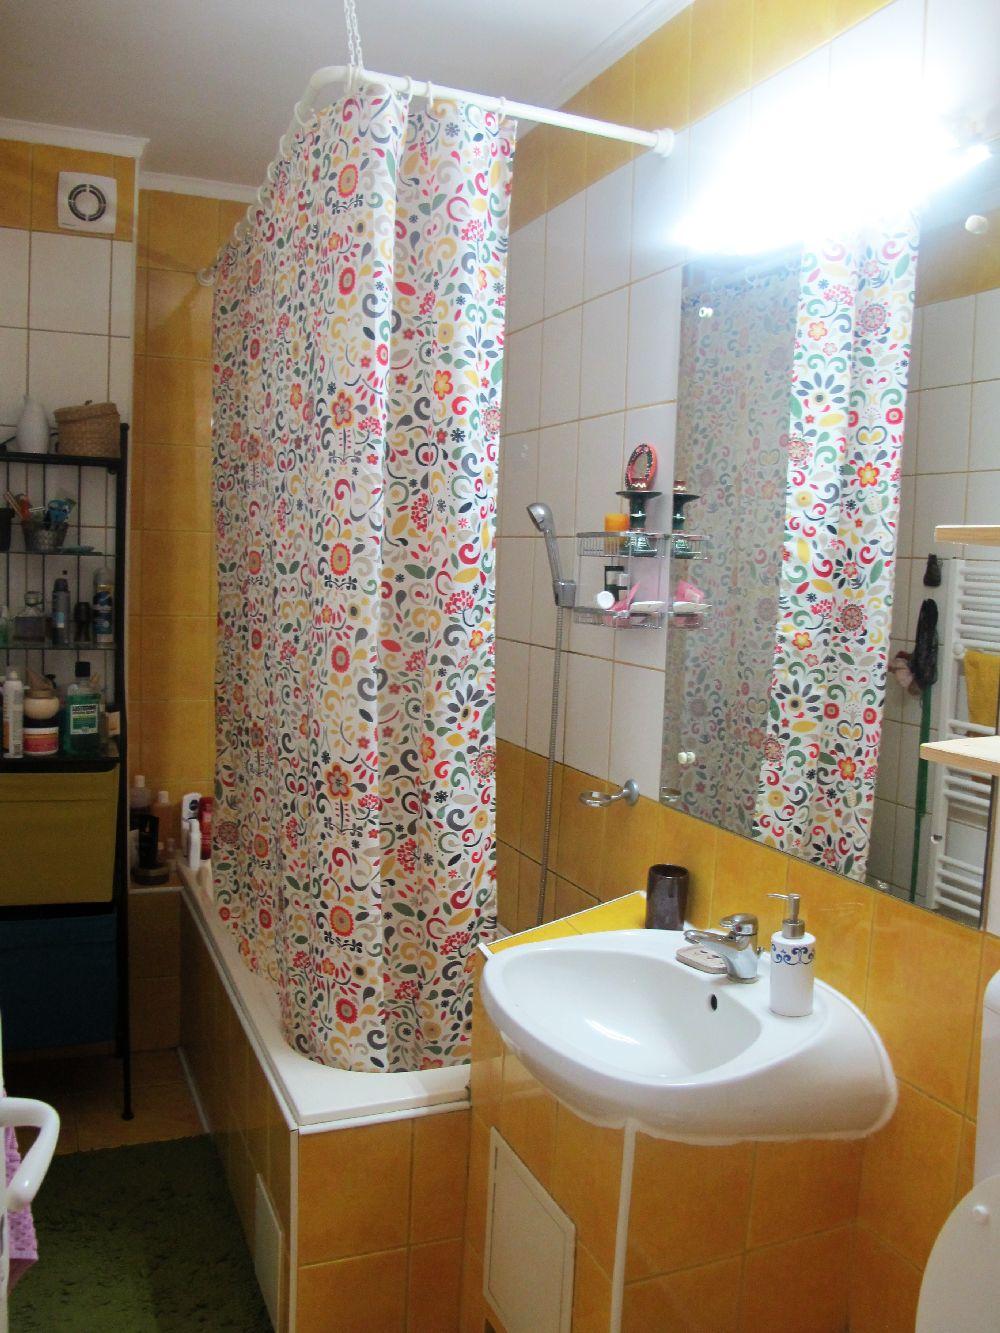 adelaparvu.com despre apartament 3 camere colorat in Sibiu, Foto Adela Parvu (88)